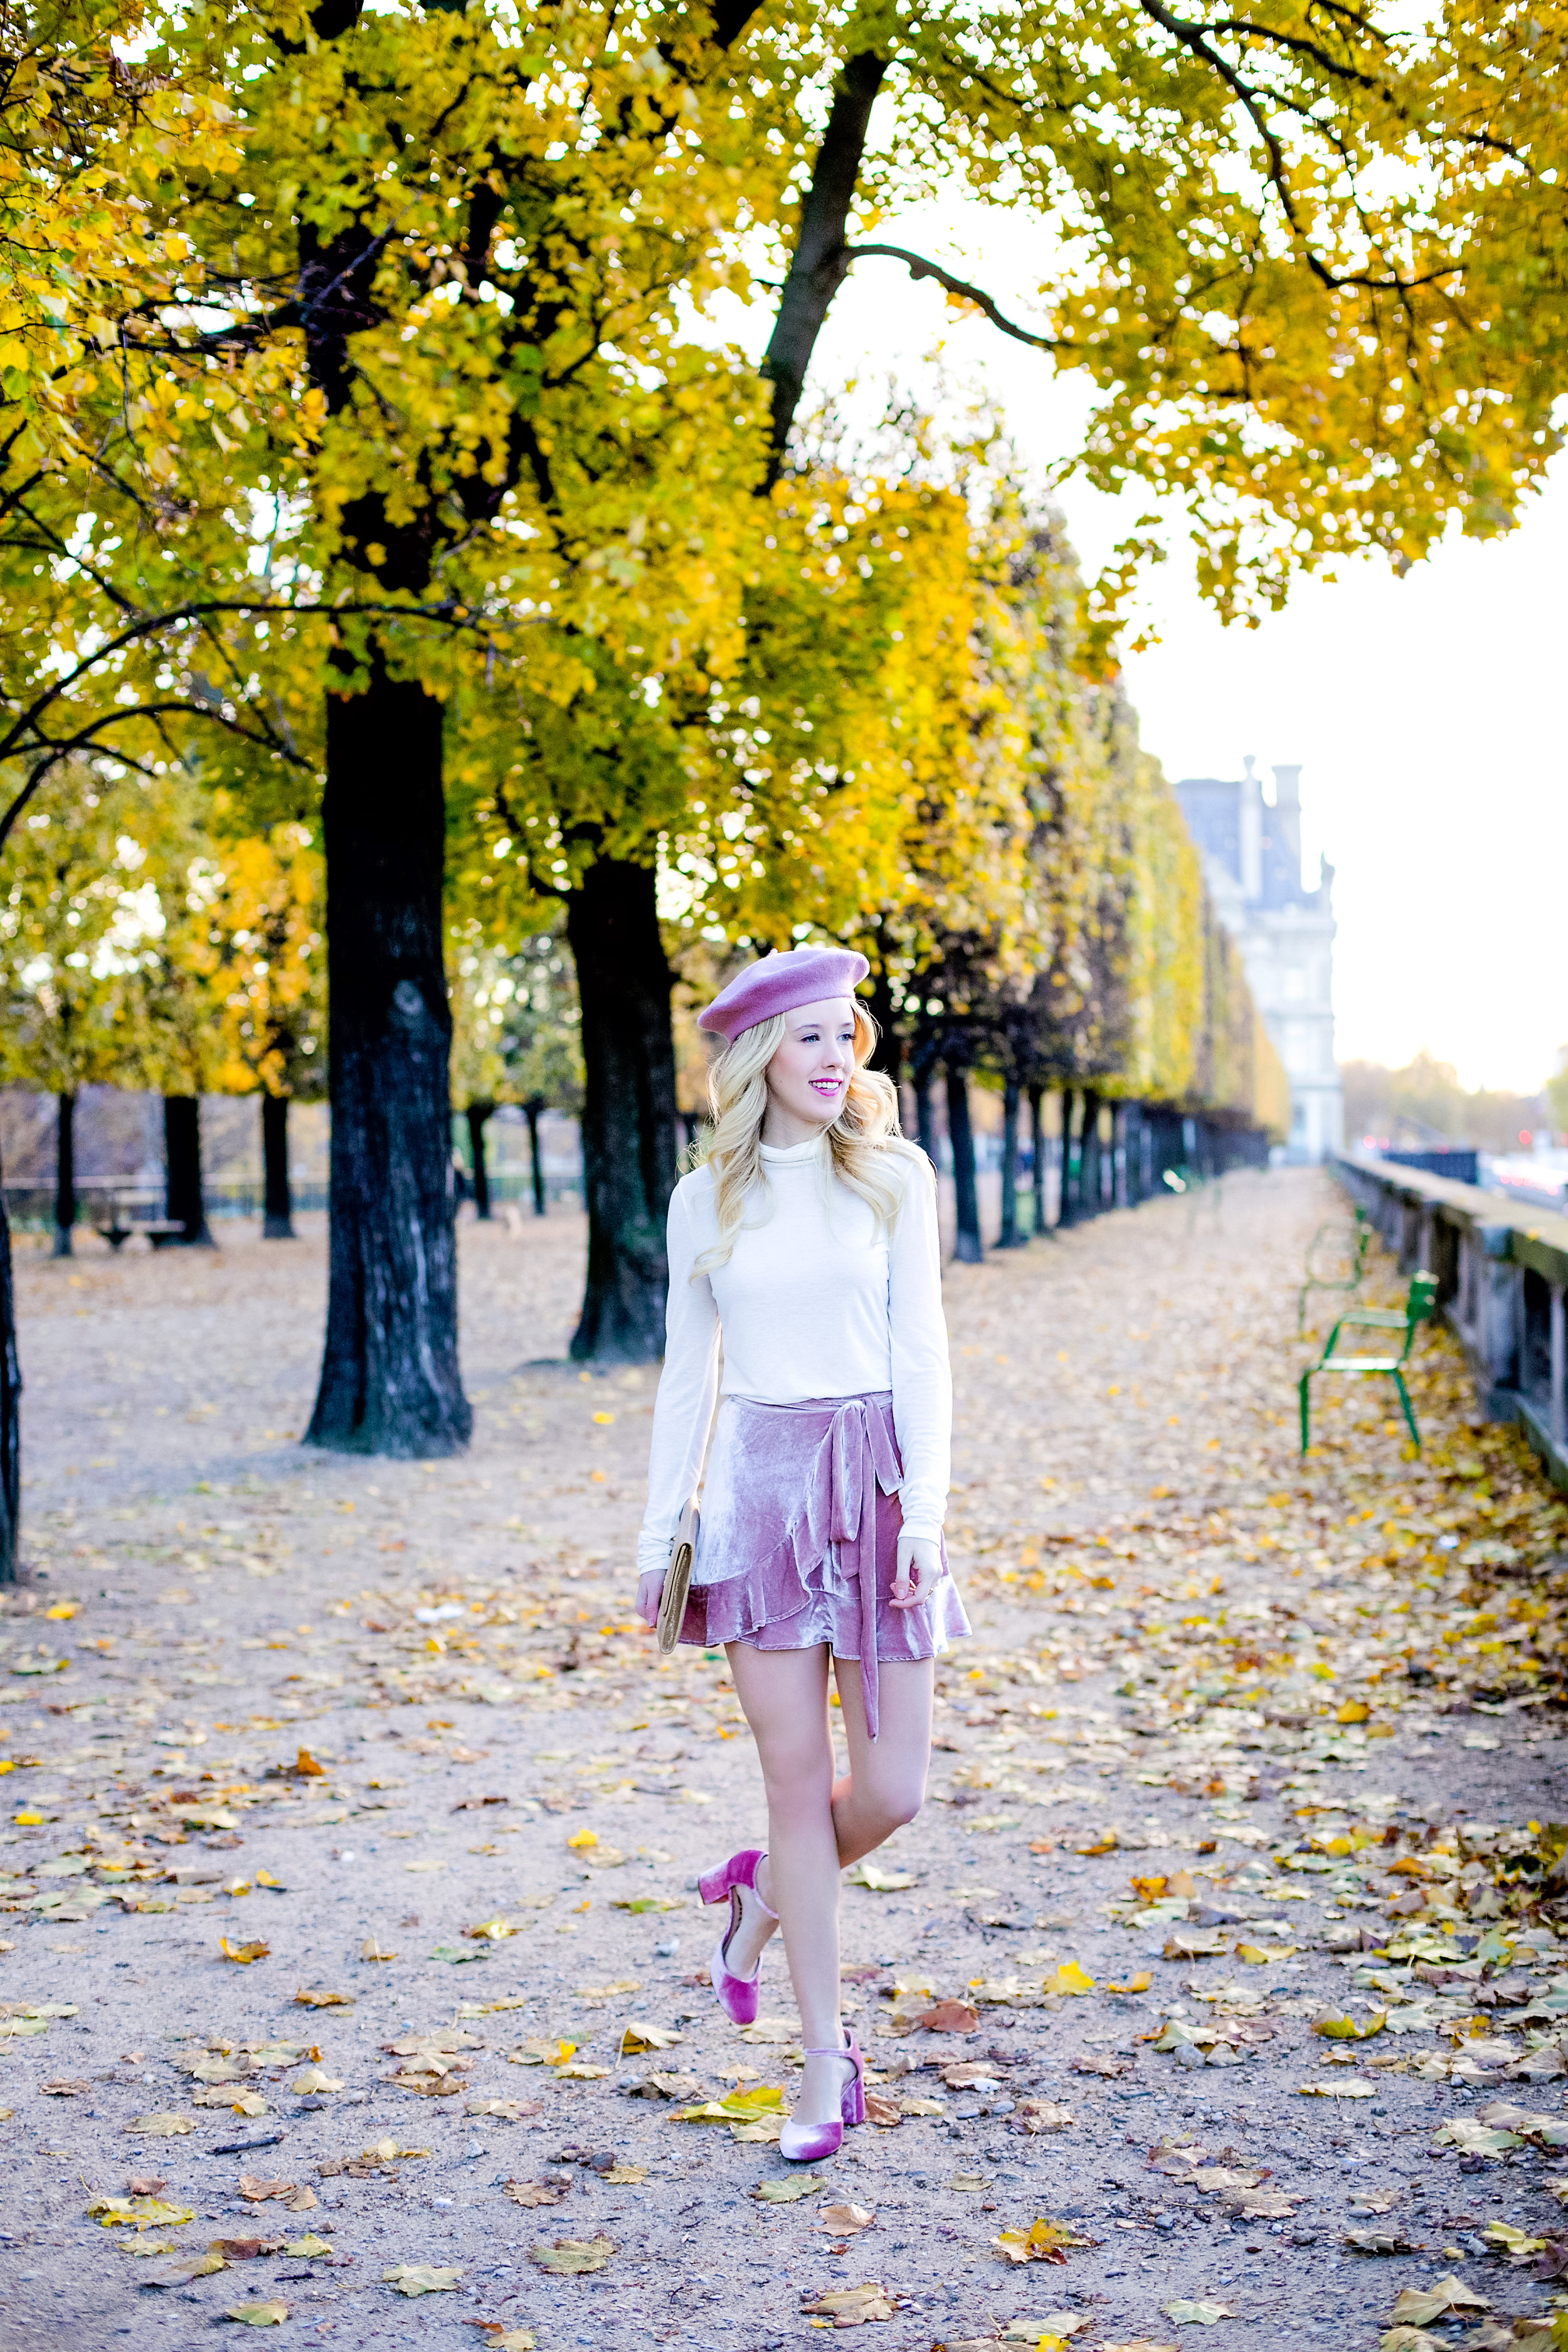 Paris_Emily10-2.jpg